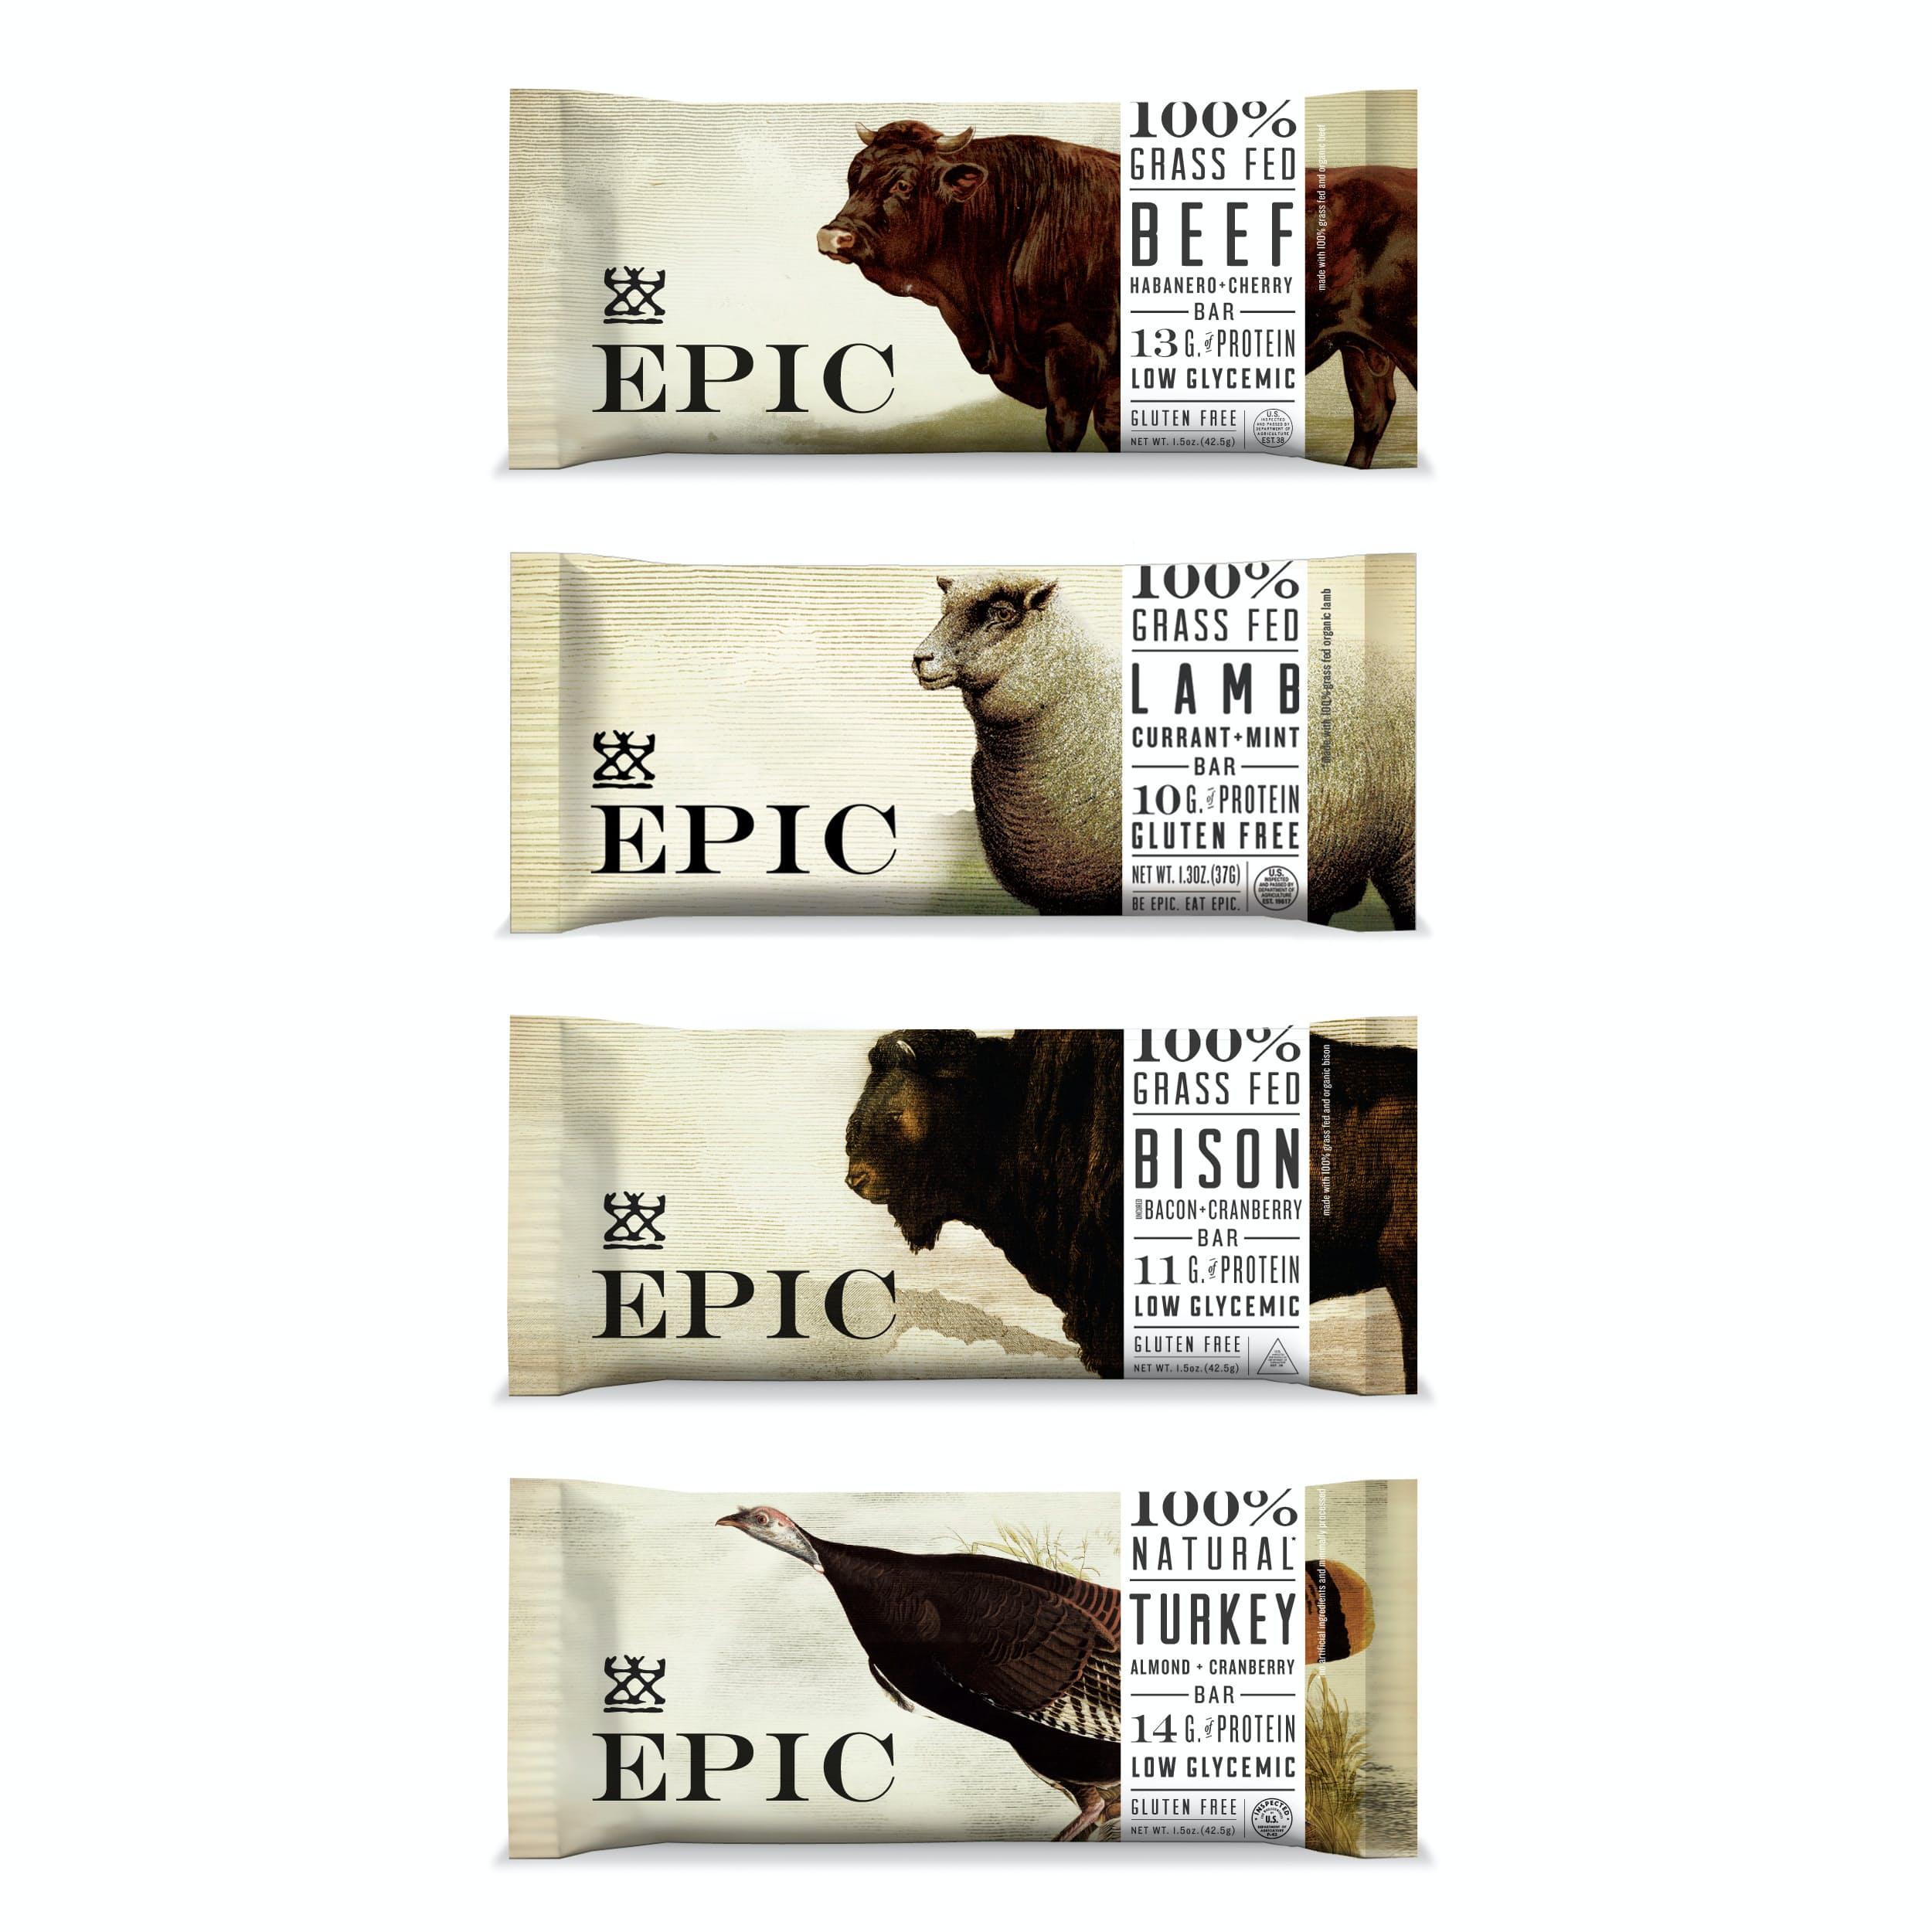 Oafpz0ezlk epic bar variety pack 3 of each flavor 0 original